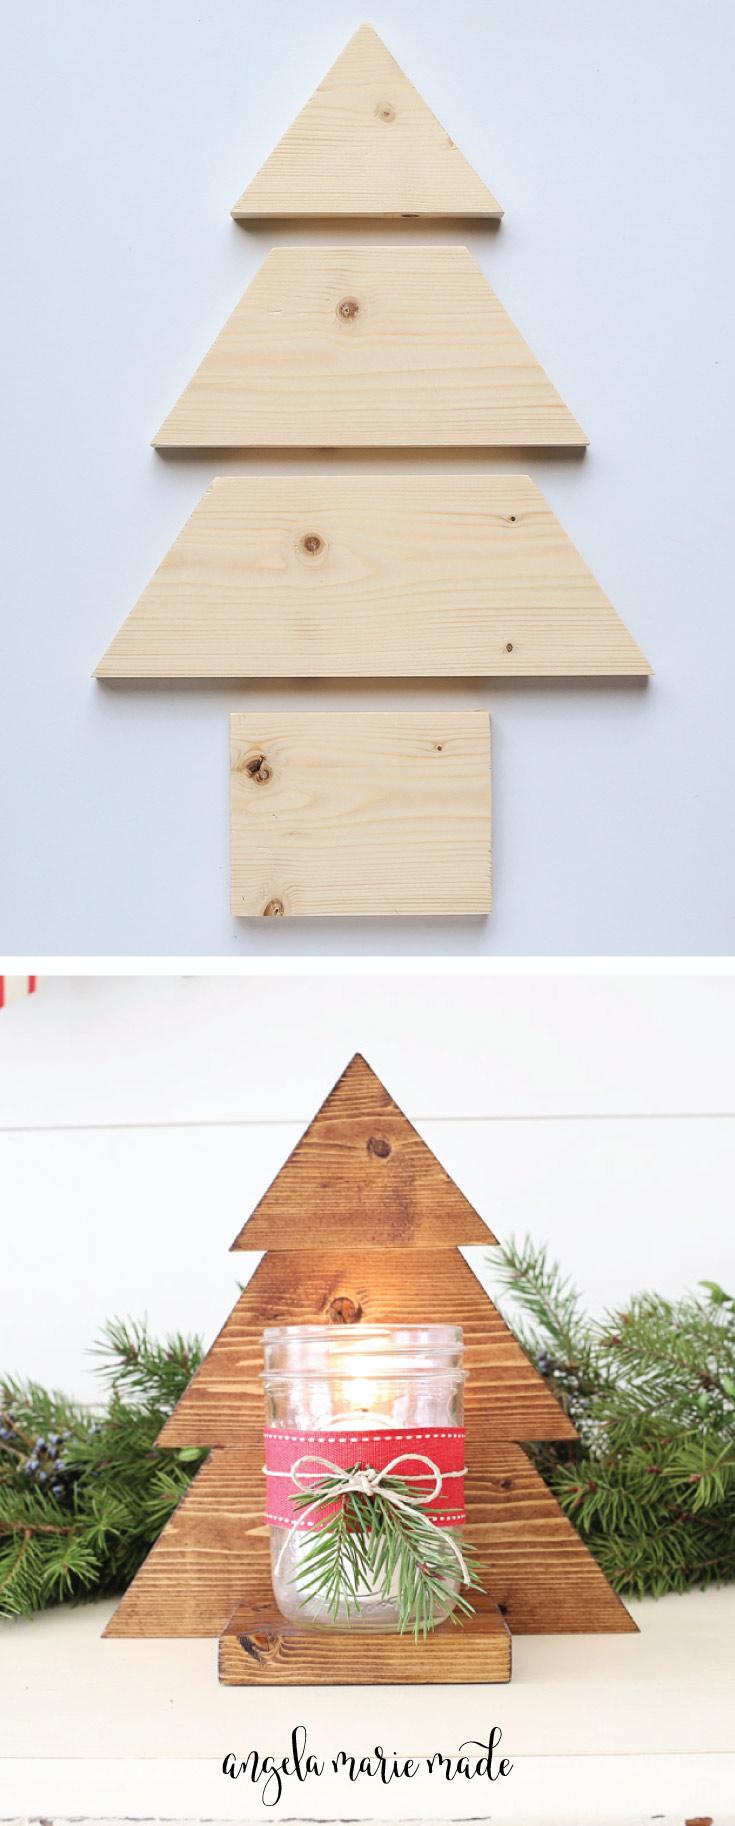 DIY Wood Christmas Tree Mason Jar Sconce (With images) | Wooden christmas trees, Wood christmas ...